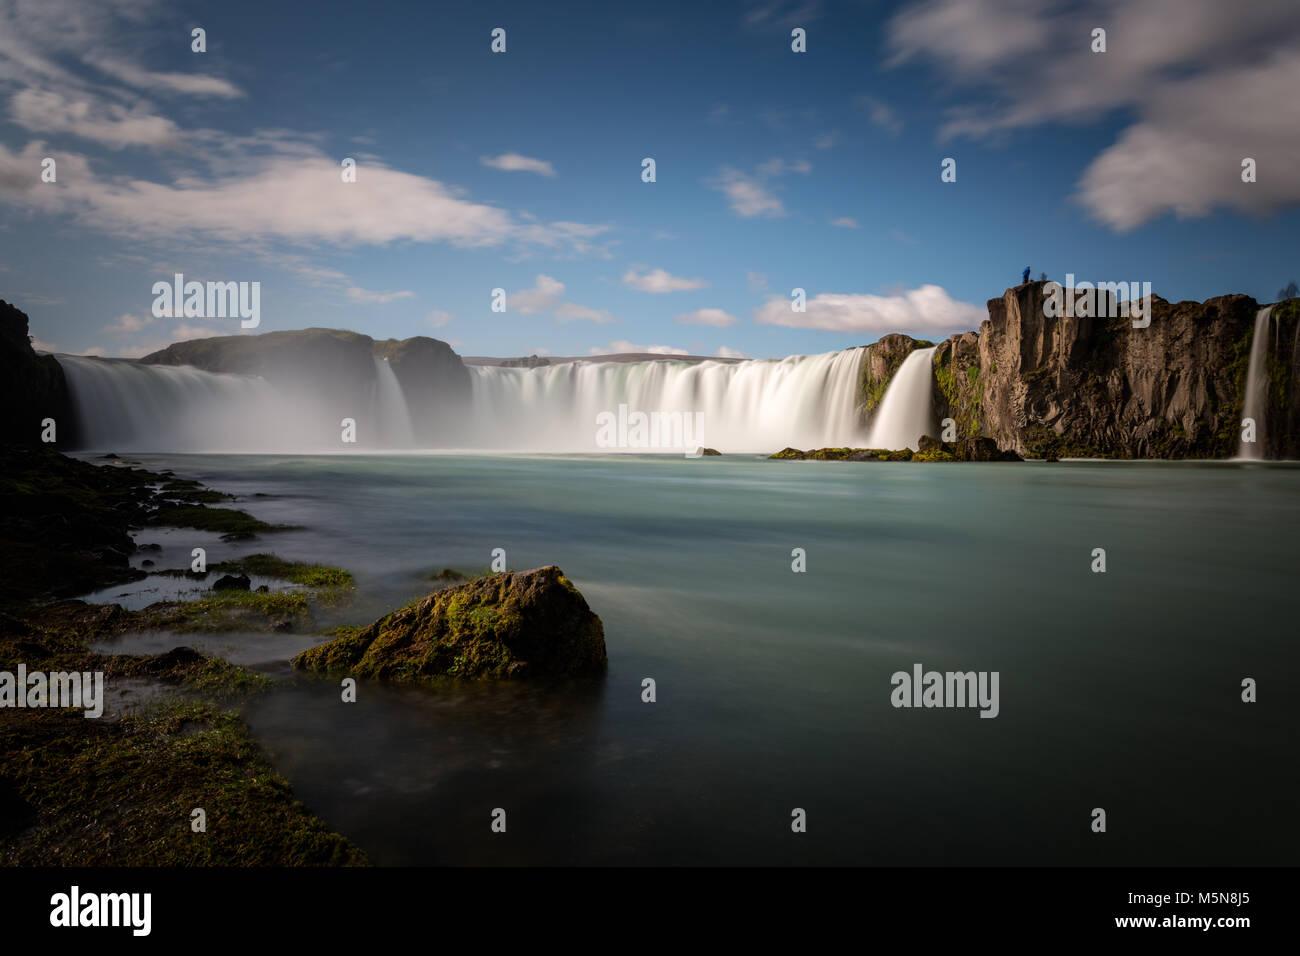 Godafoss waterfall and landscape, Iceland, Europe - Stock Image